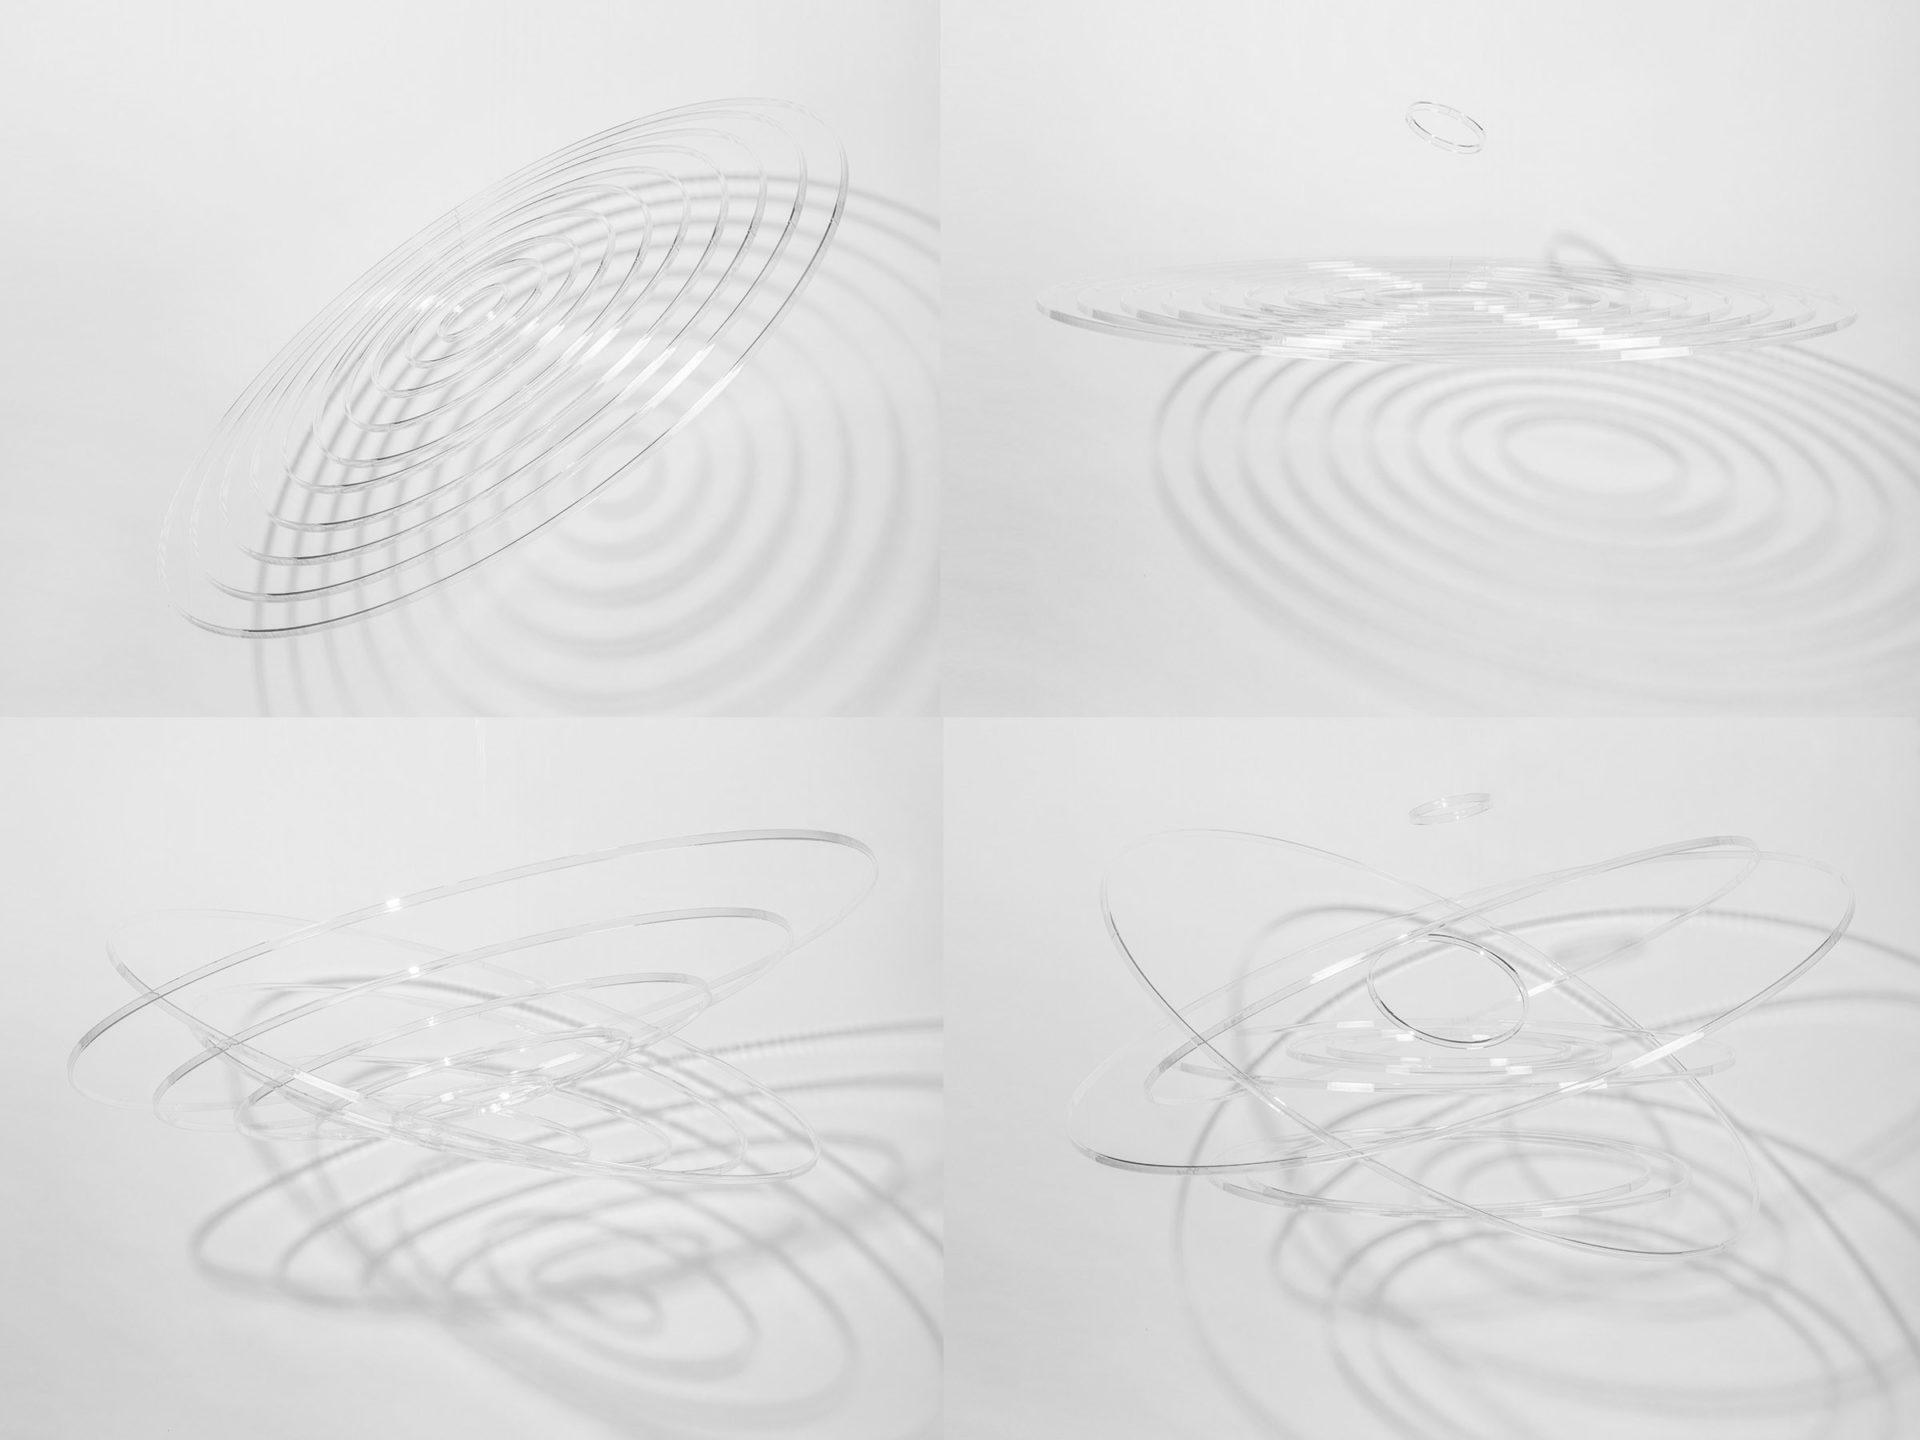 Elias Crespin Circuconcéntricos Transparente